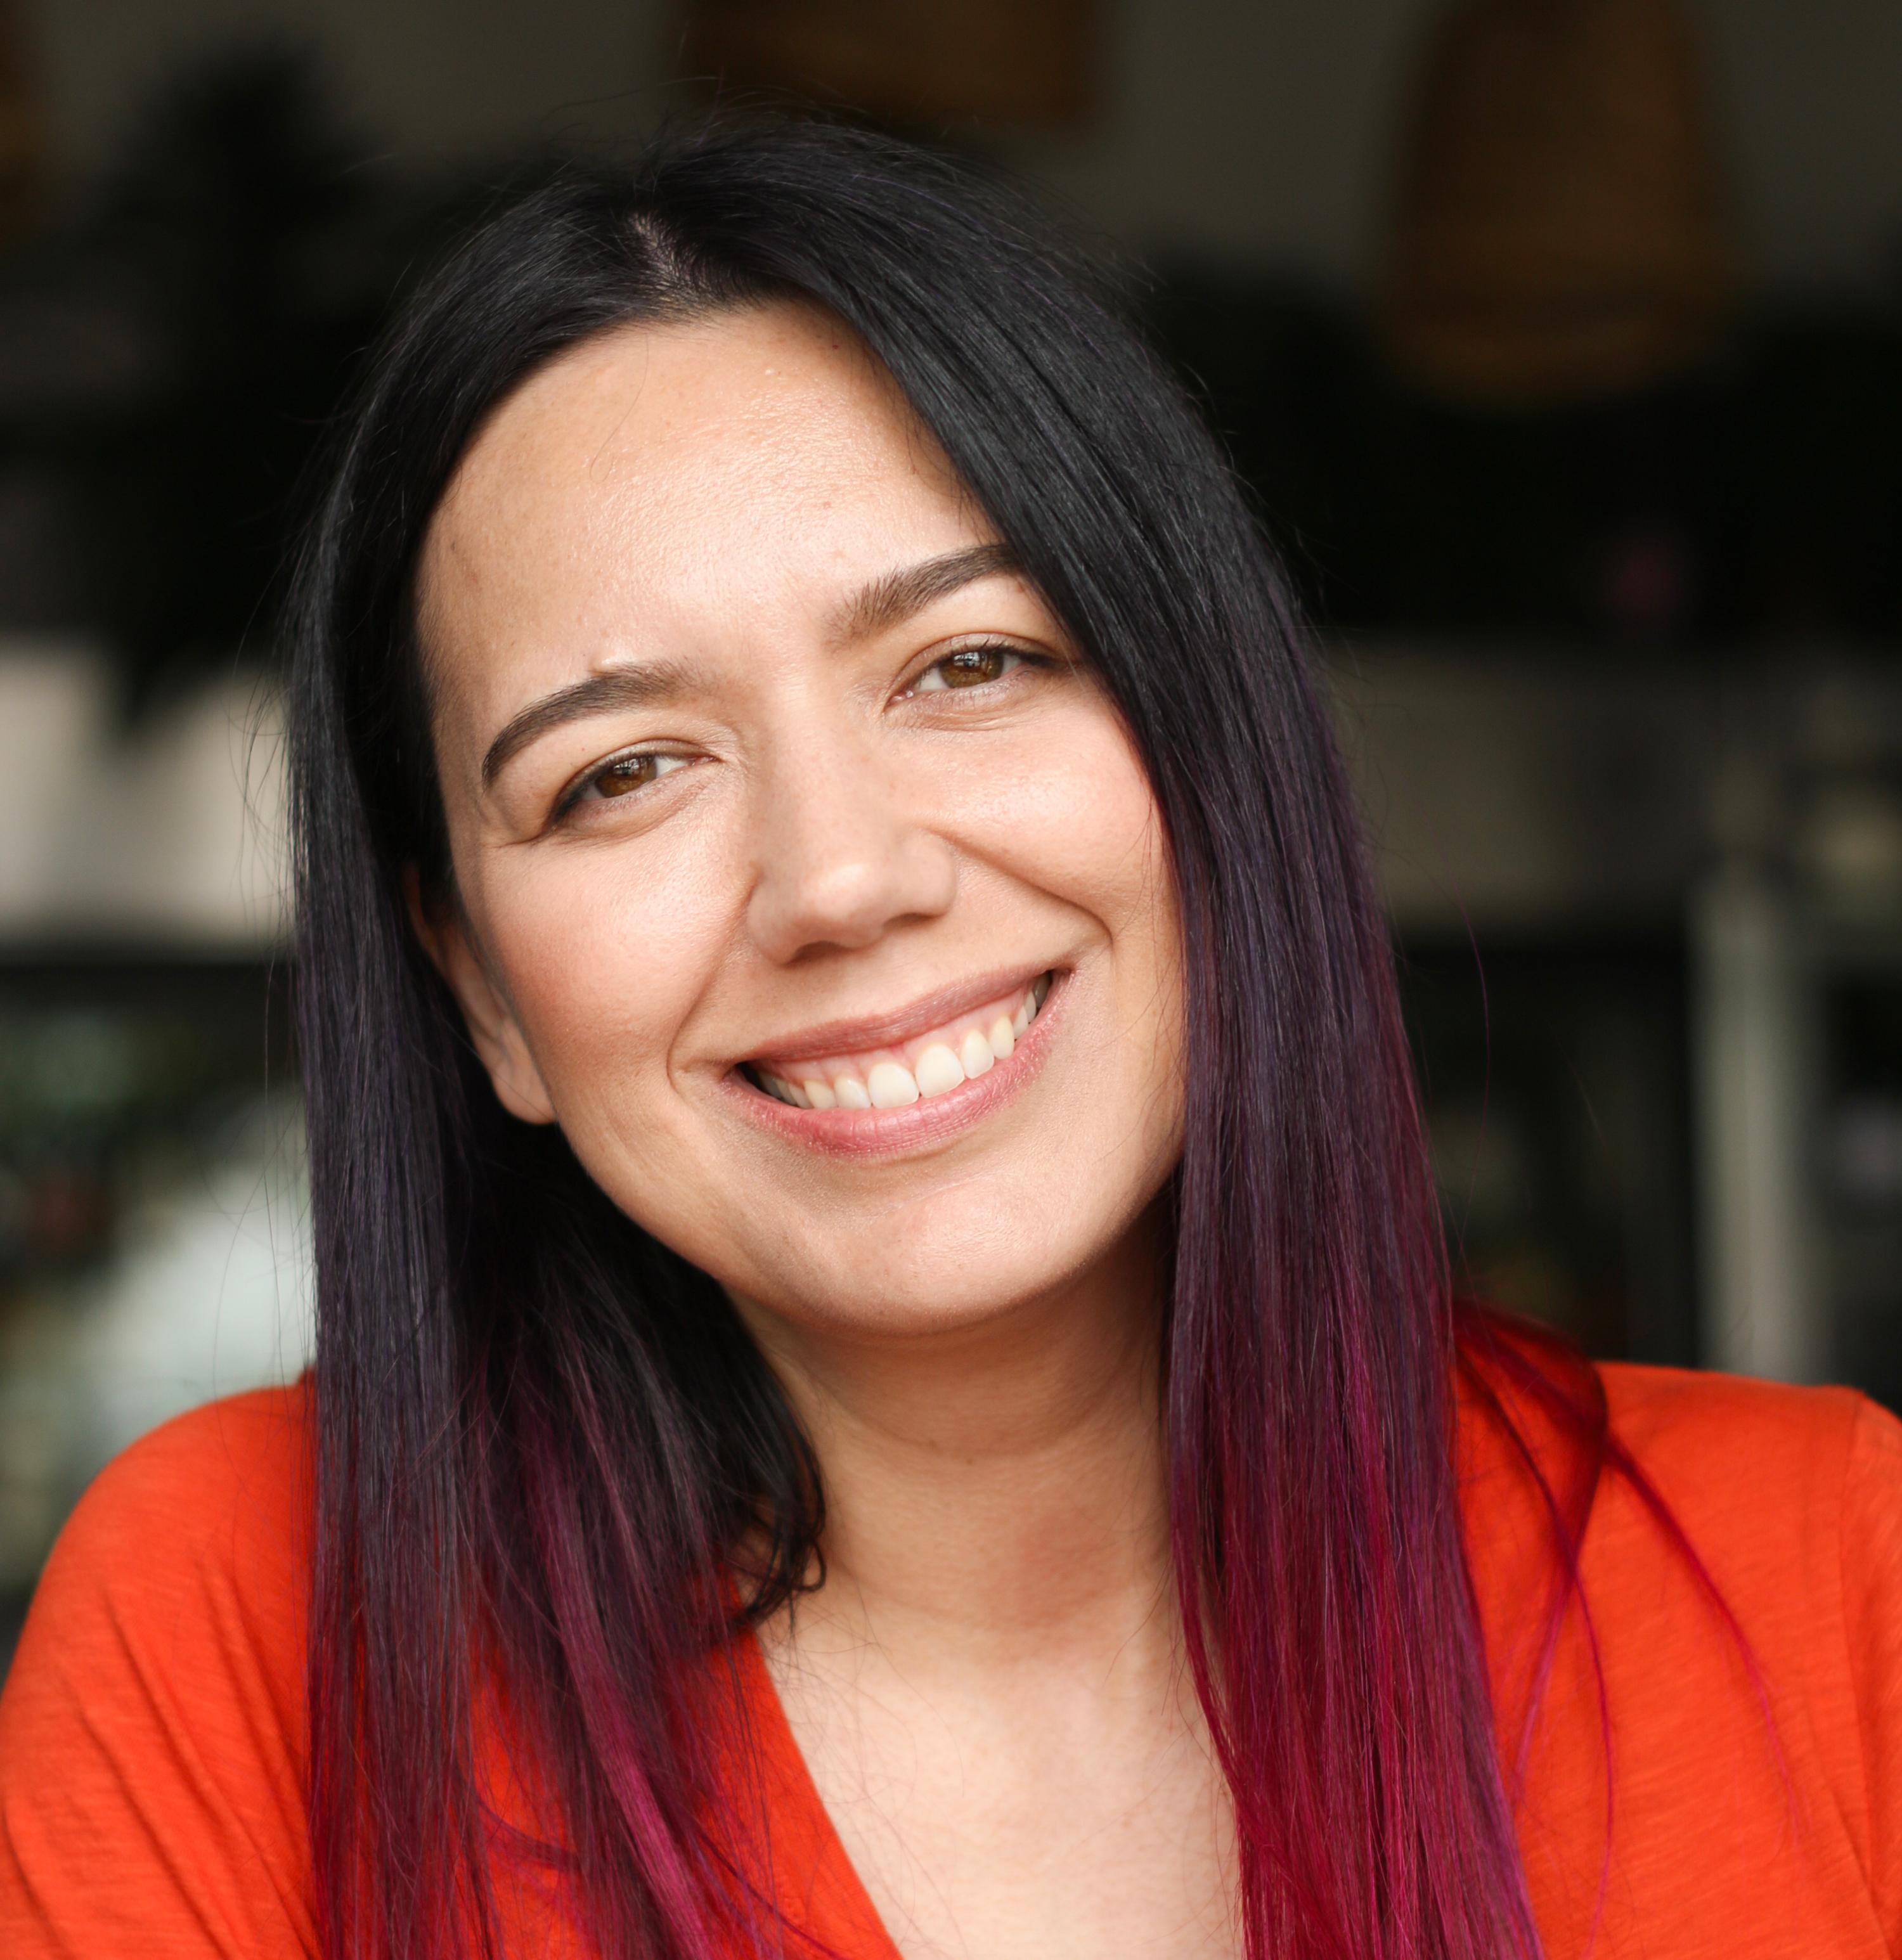 Paola Mendez